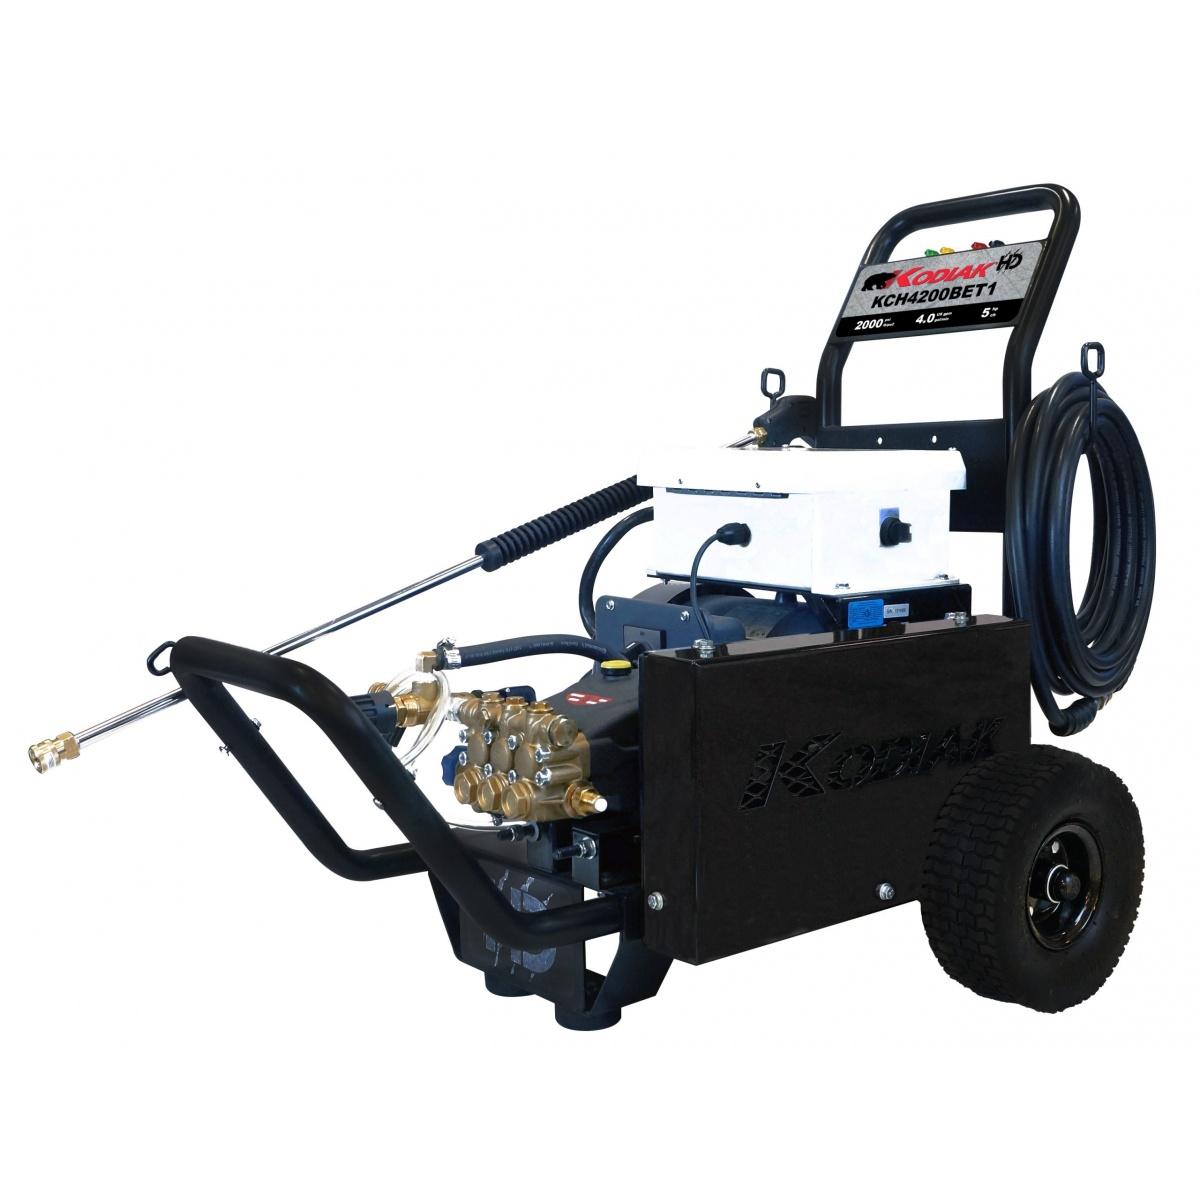 Kodiak KCH4200BET1 Cold Water Pressure Washer